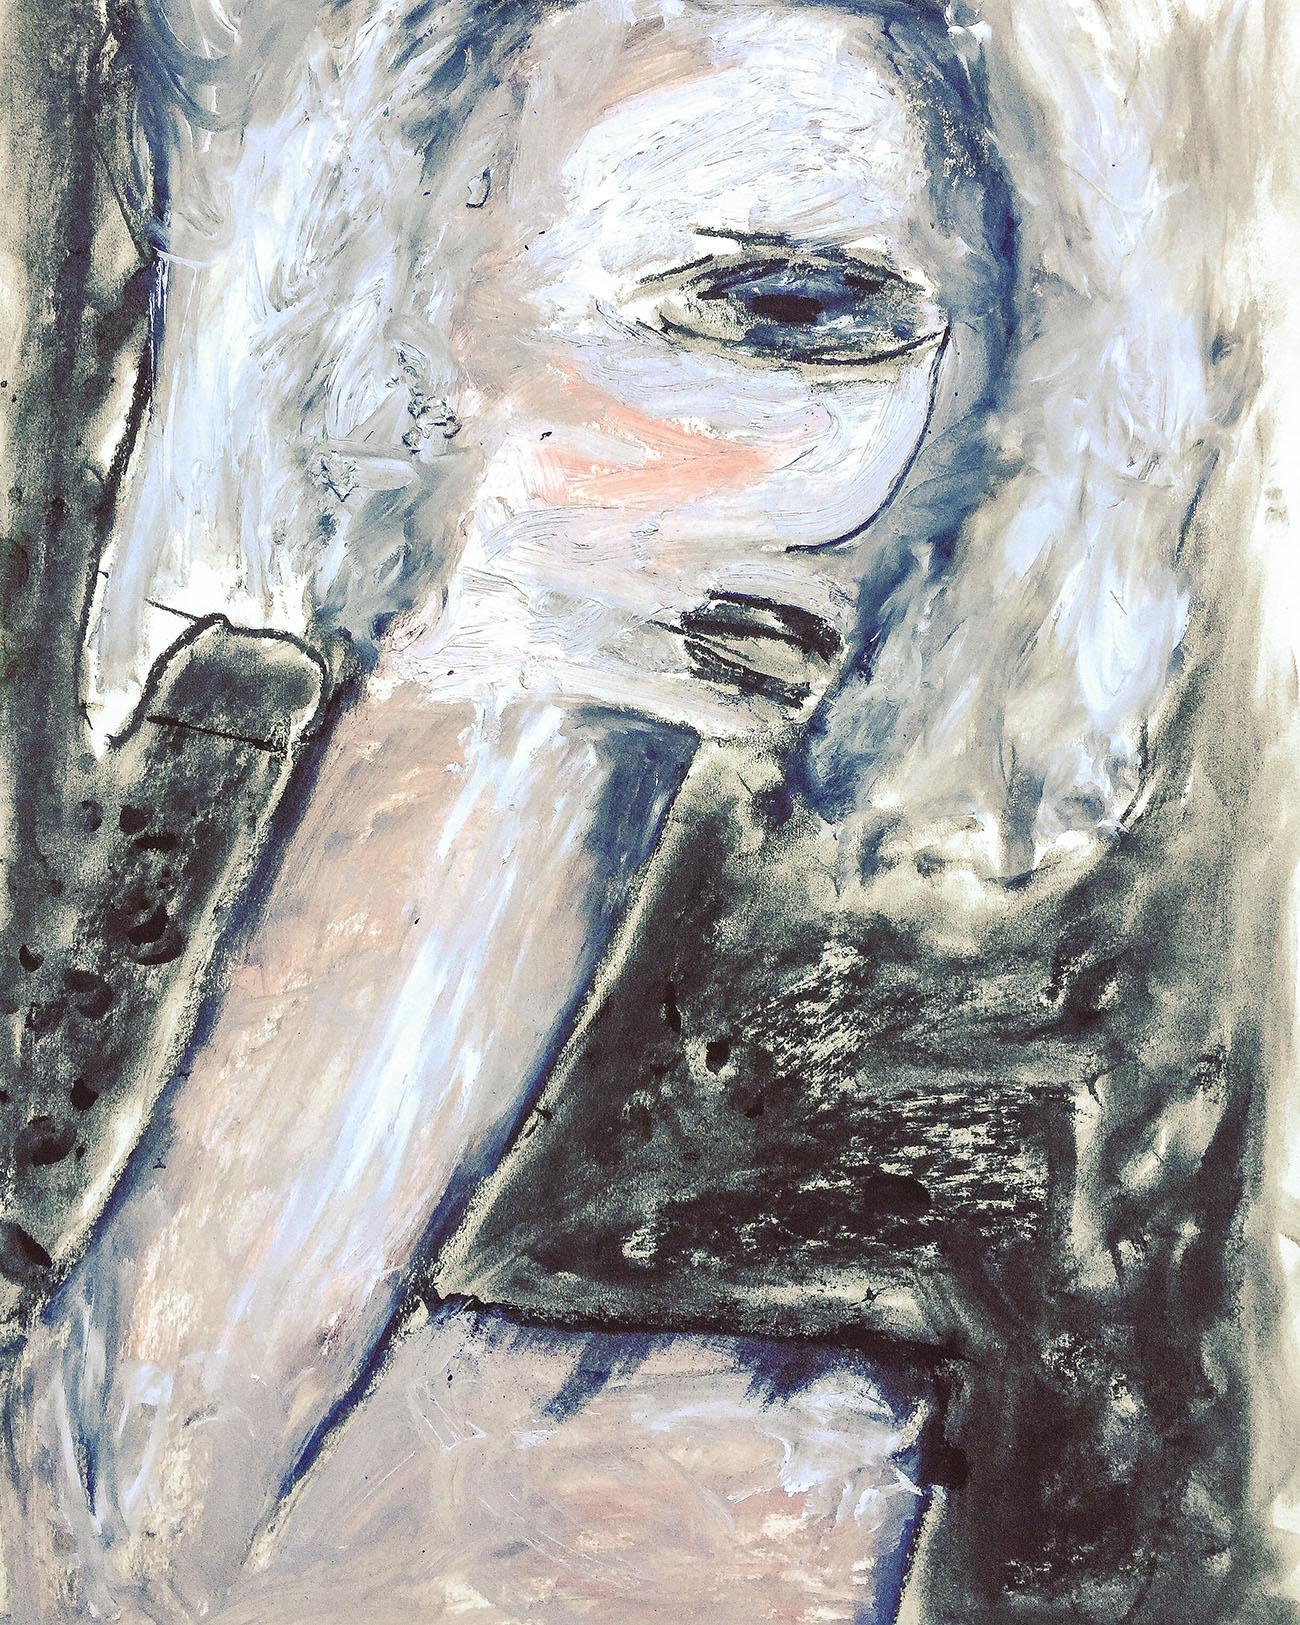 "Moderne Gemälde / Kohle Malerei ""Faces Bliss"", Kvila Bristenia, 50x65, Mischtechniken mit Kohle und Ölfarben/Oil with coal on paper, 03.2018"